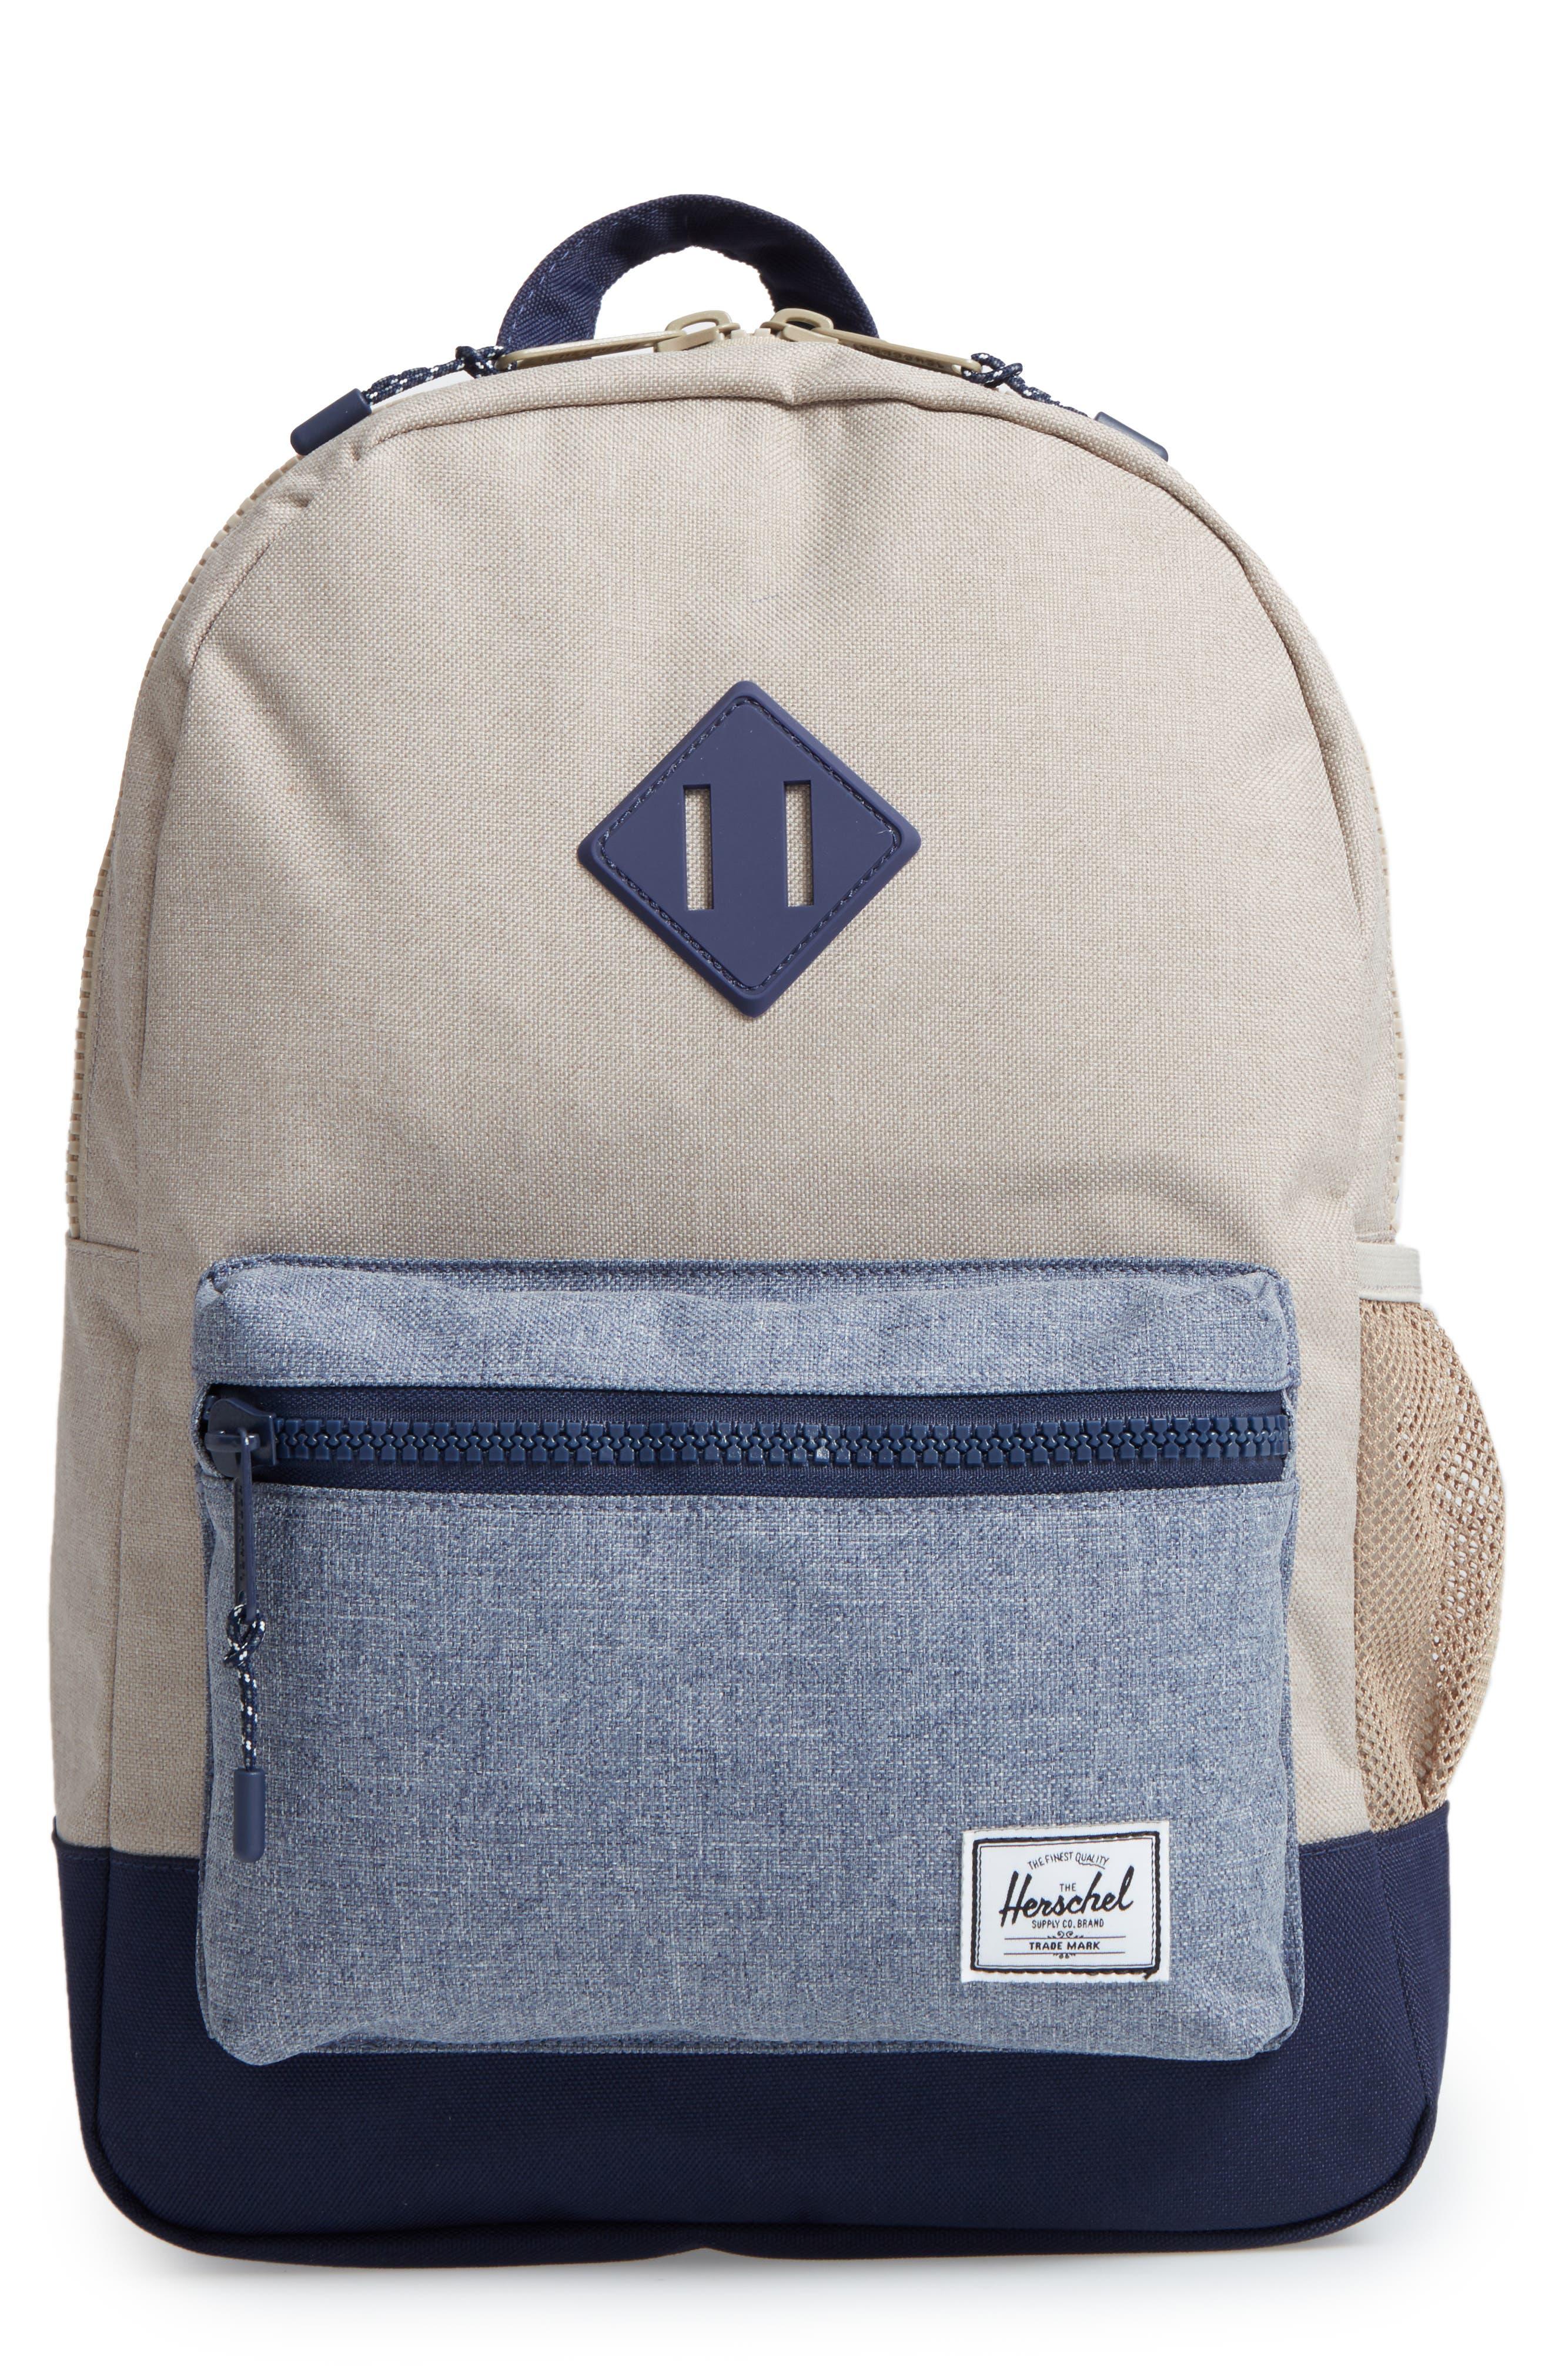 Heritage Backpack,                         Main,                         color, Khaki Chambray Crosshatch